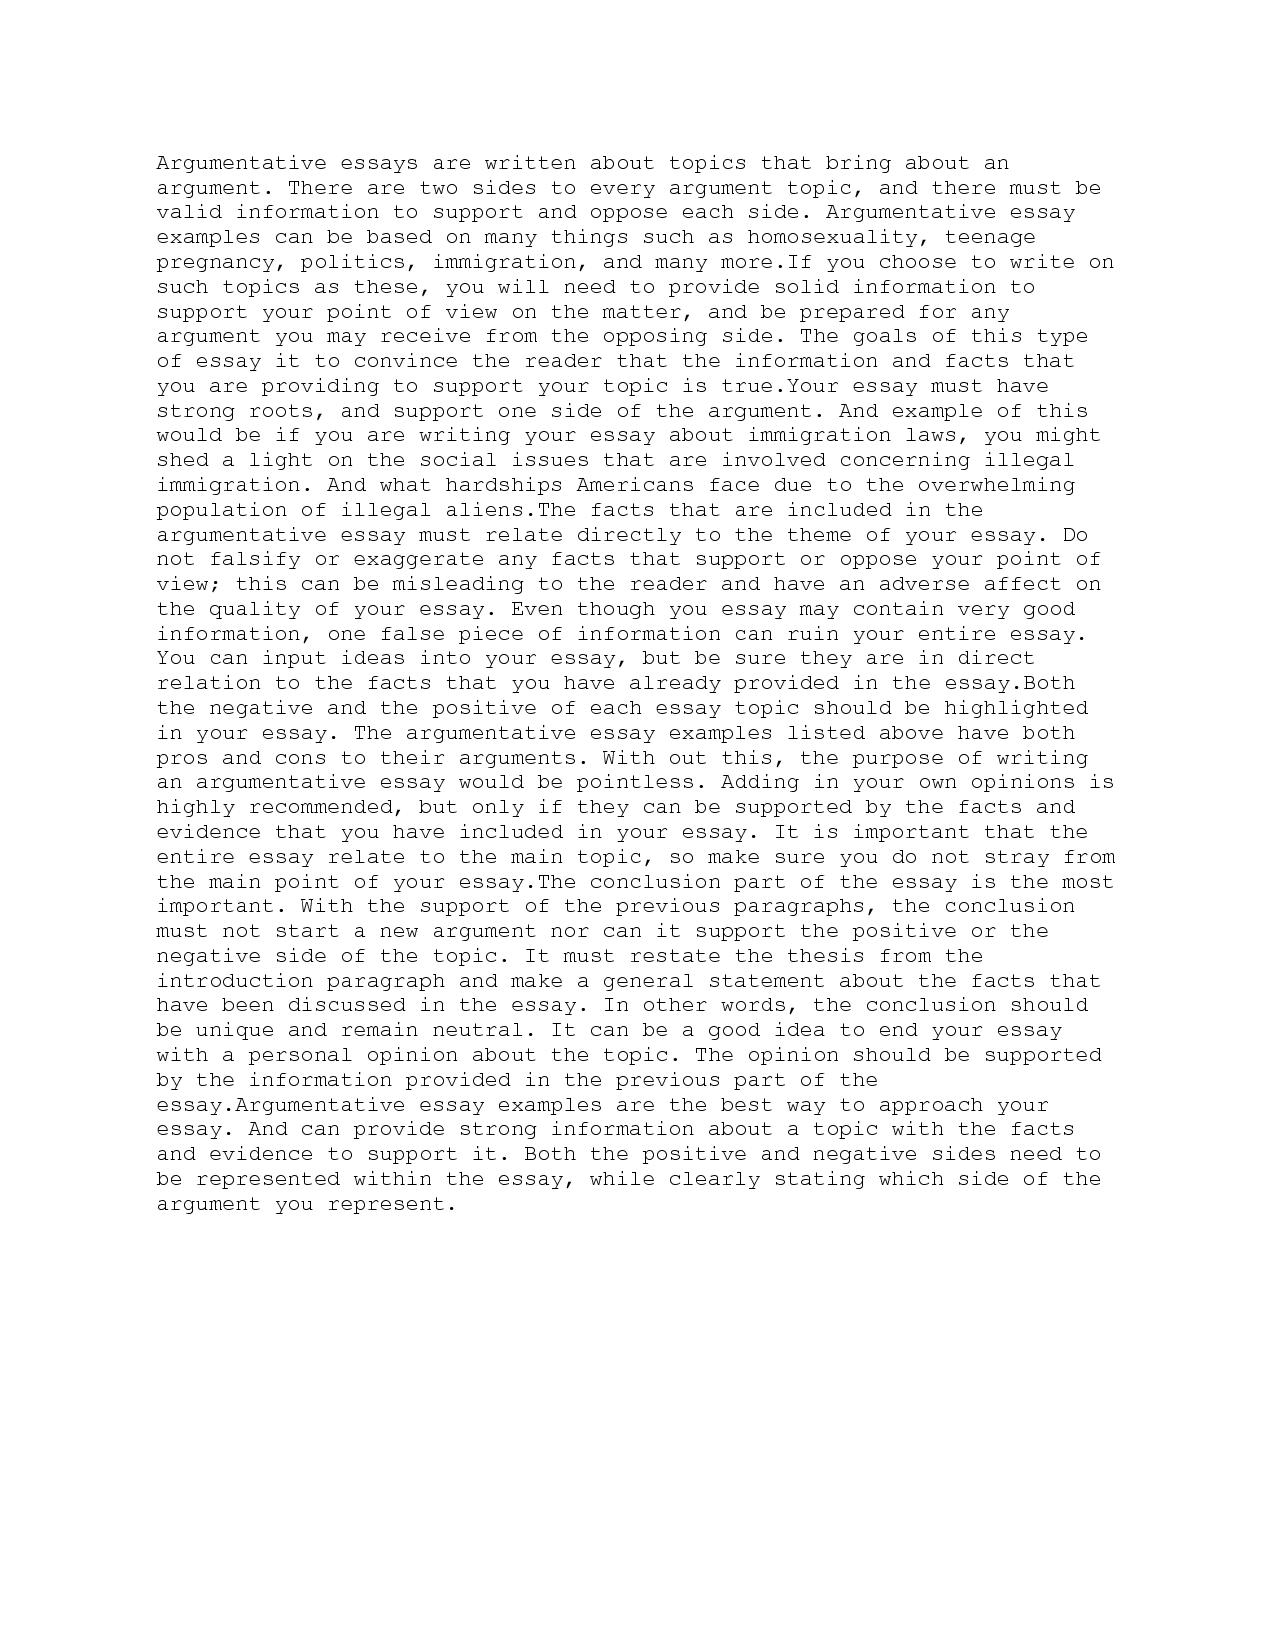 021 Essay Example Qv3jjq5wkt Good Hooks For Essays Excellent Examples Persuasive Narrative Full